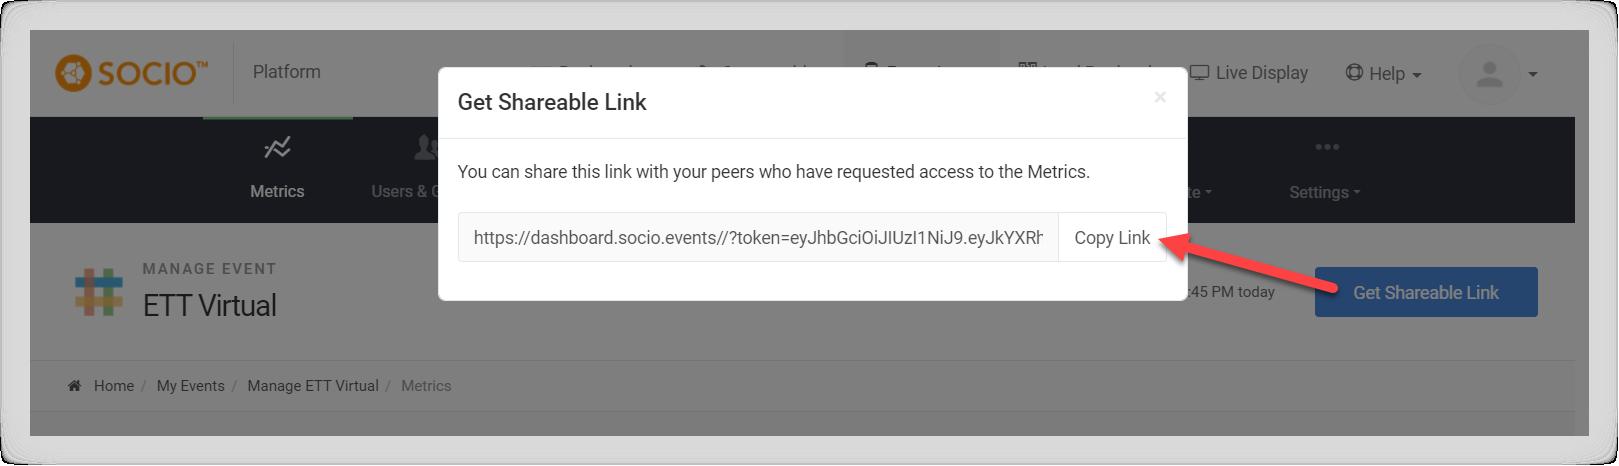 Screenshot of the Get Shareable Link modal.